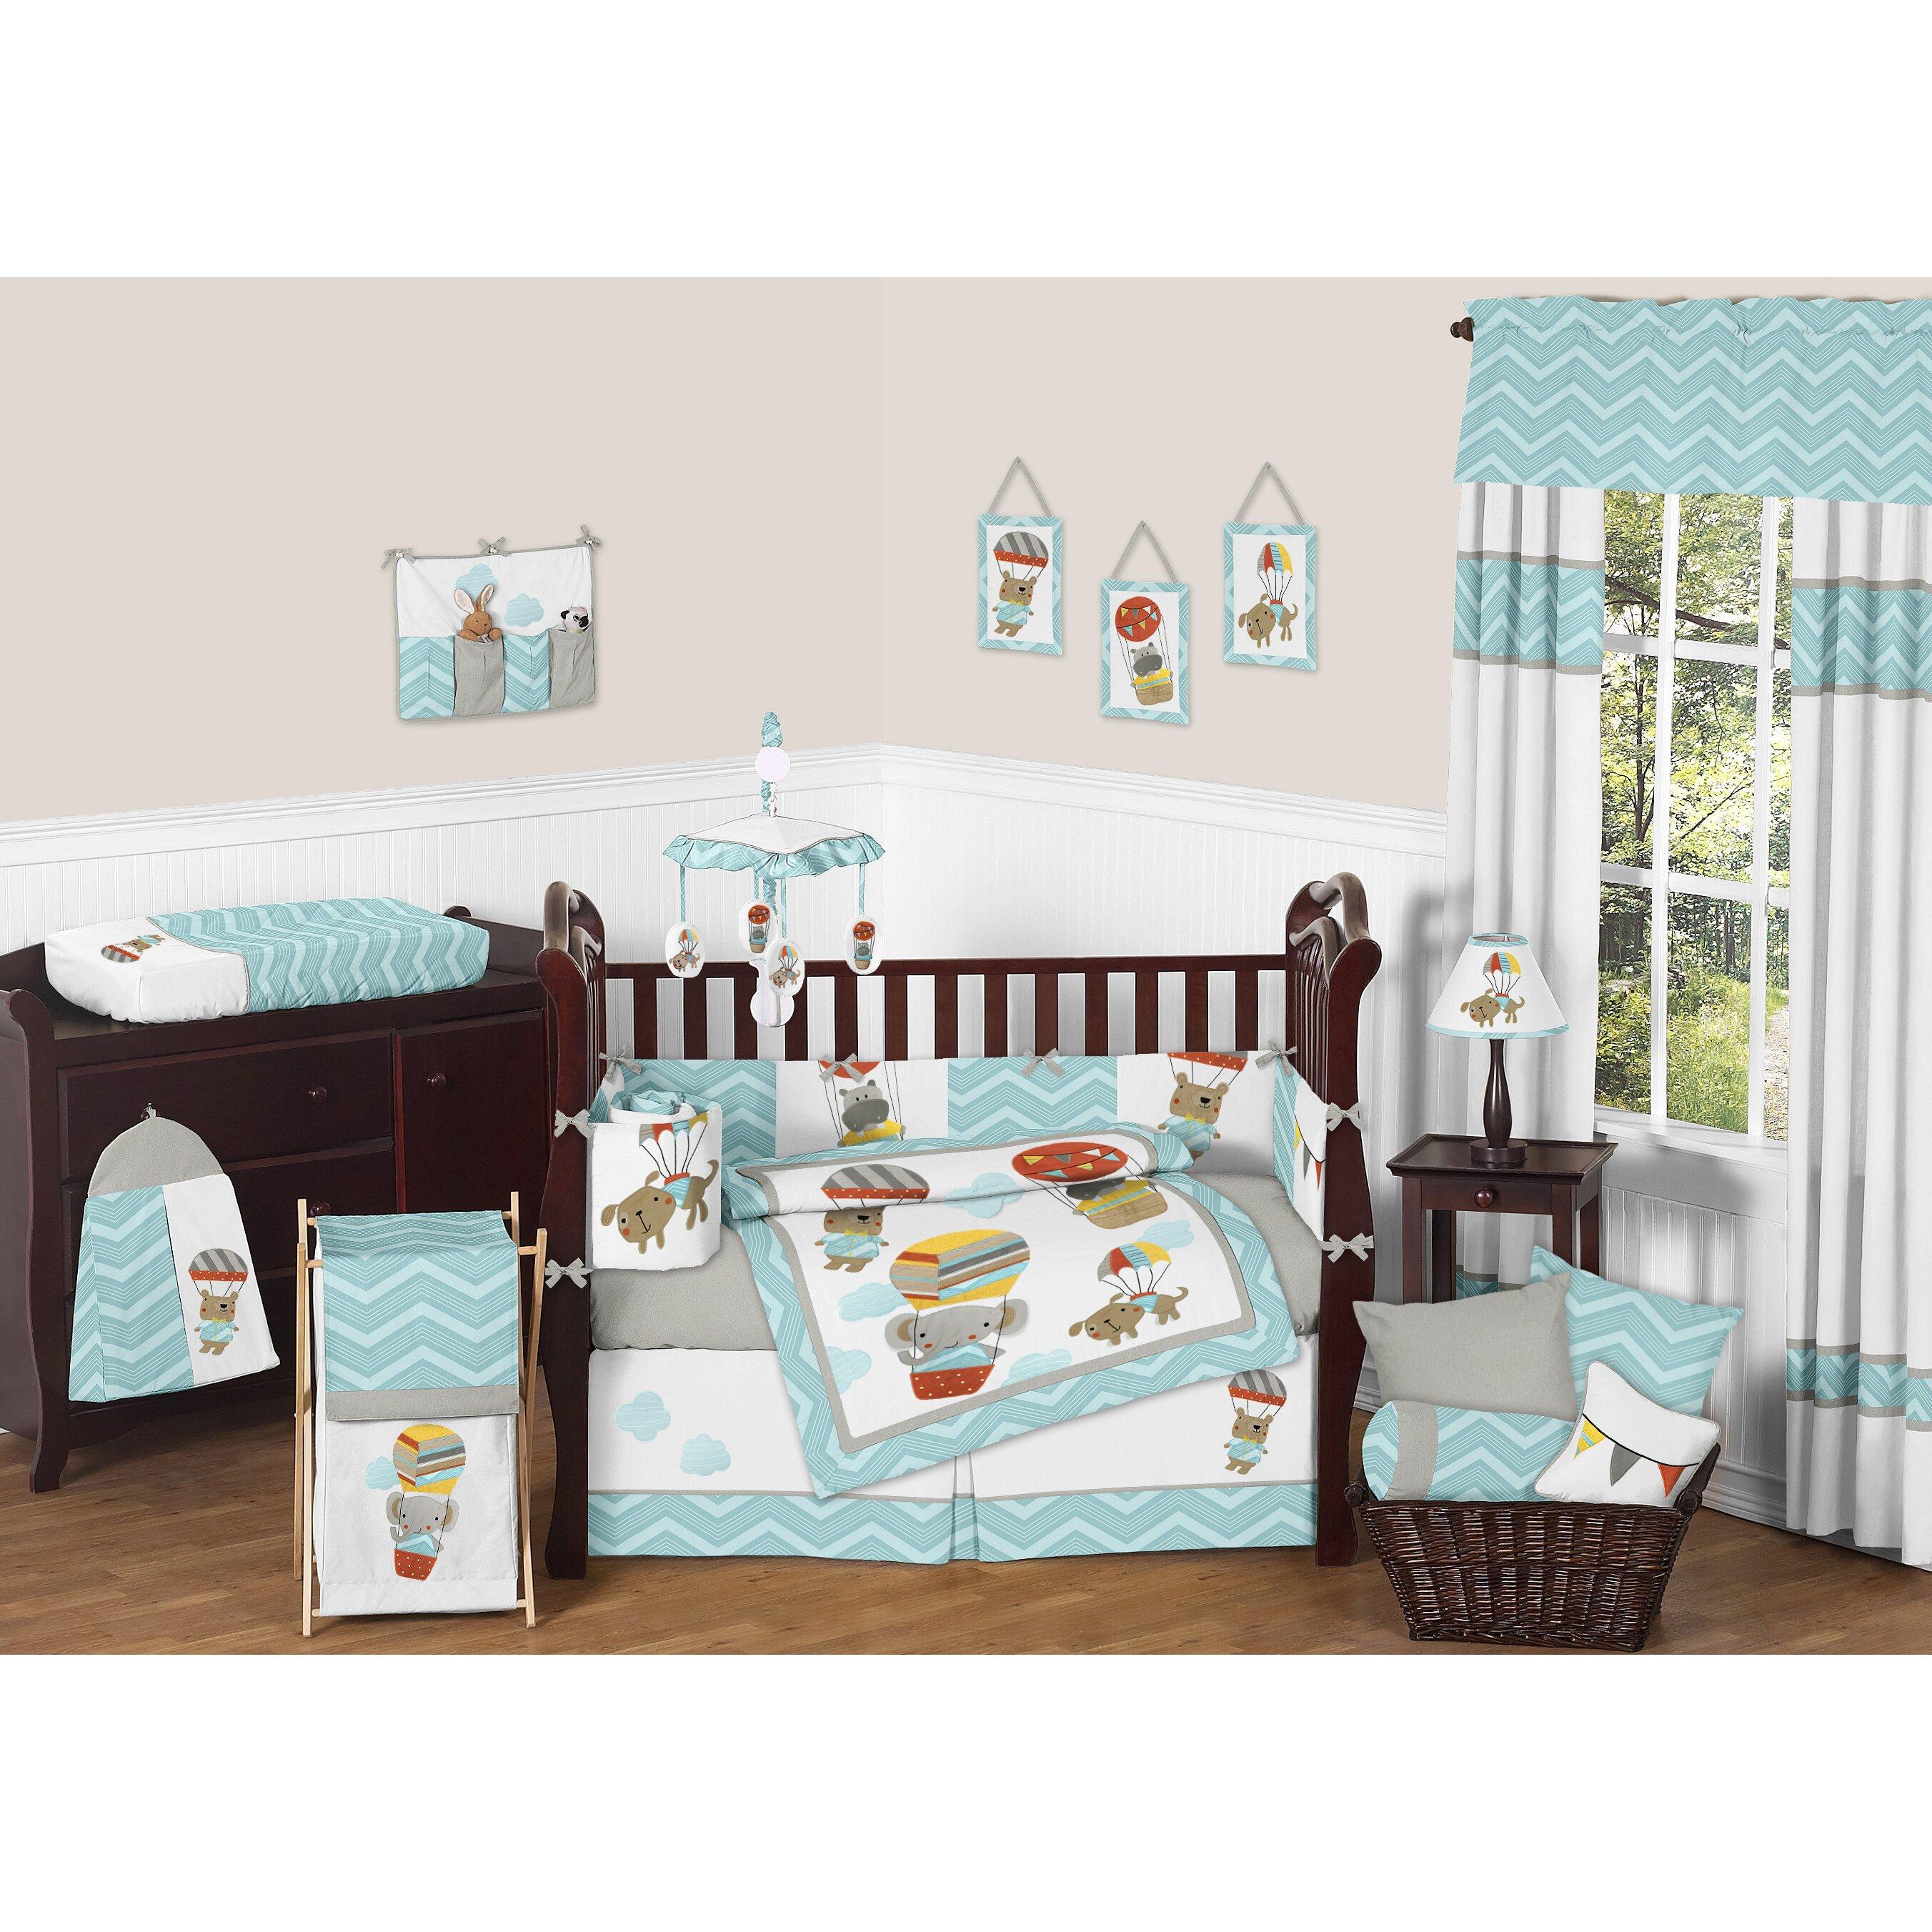 Sweet Jojo Crib Bedding 28 Images Sweet Jojo Designs Elizabeth Crib Bedding Collection